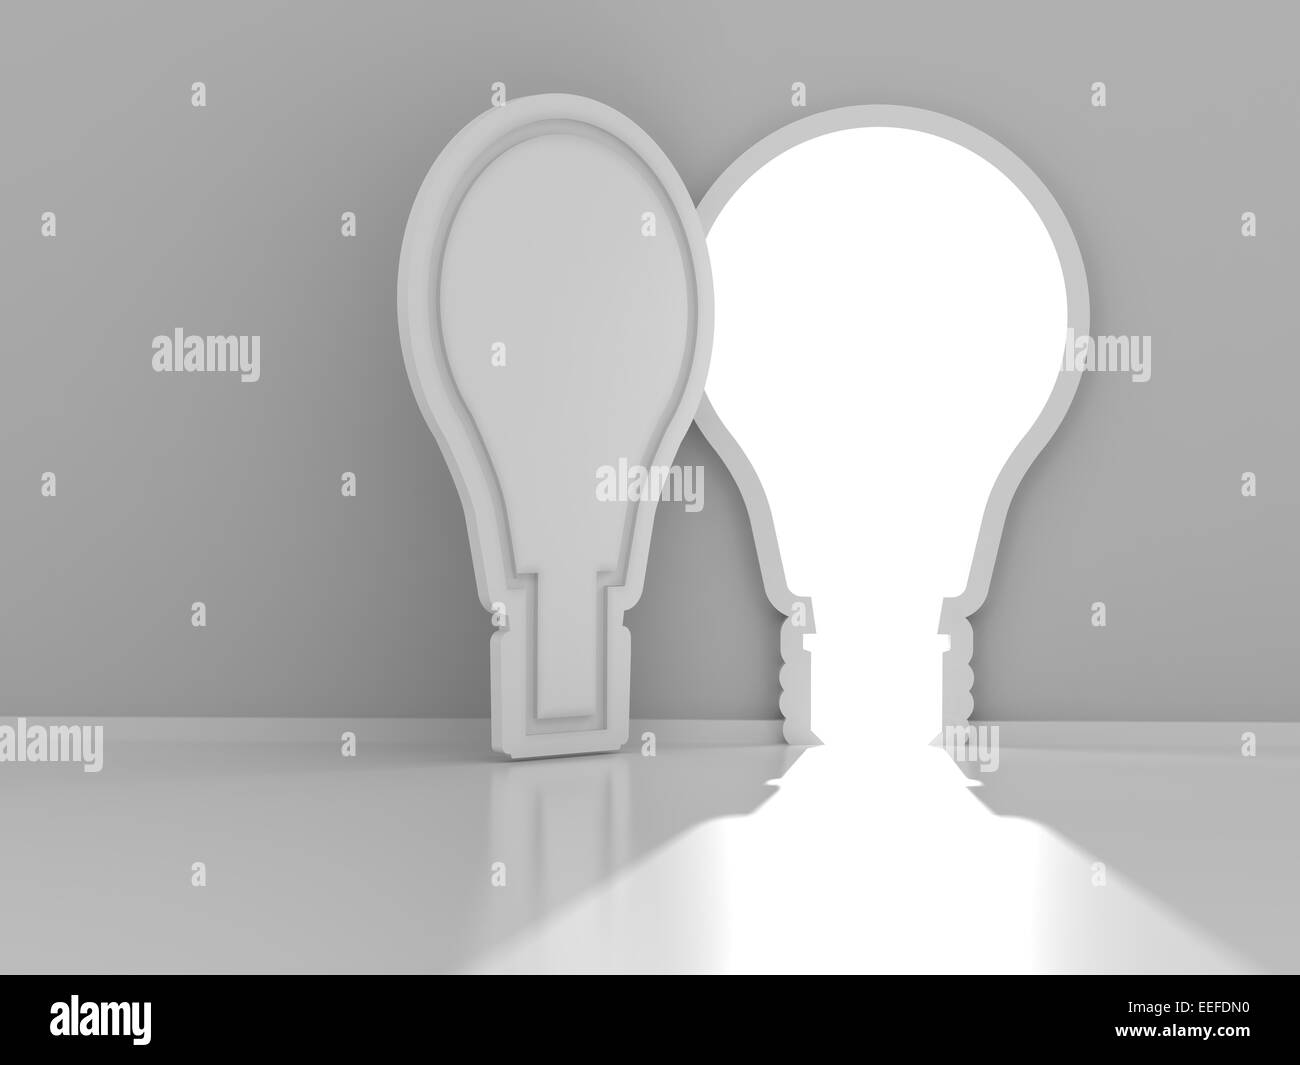 Puerta en forma de bombilla con copyspace, 3D Render Imagen De Stock